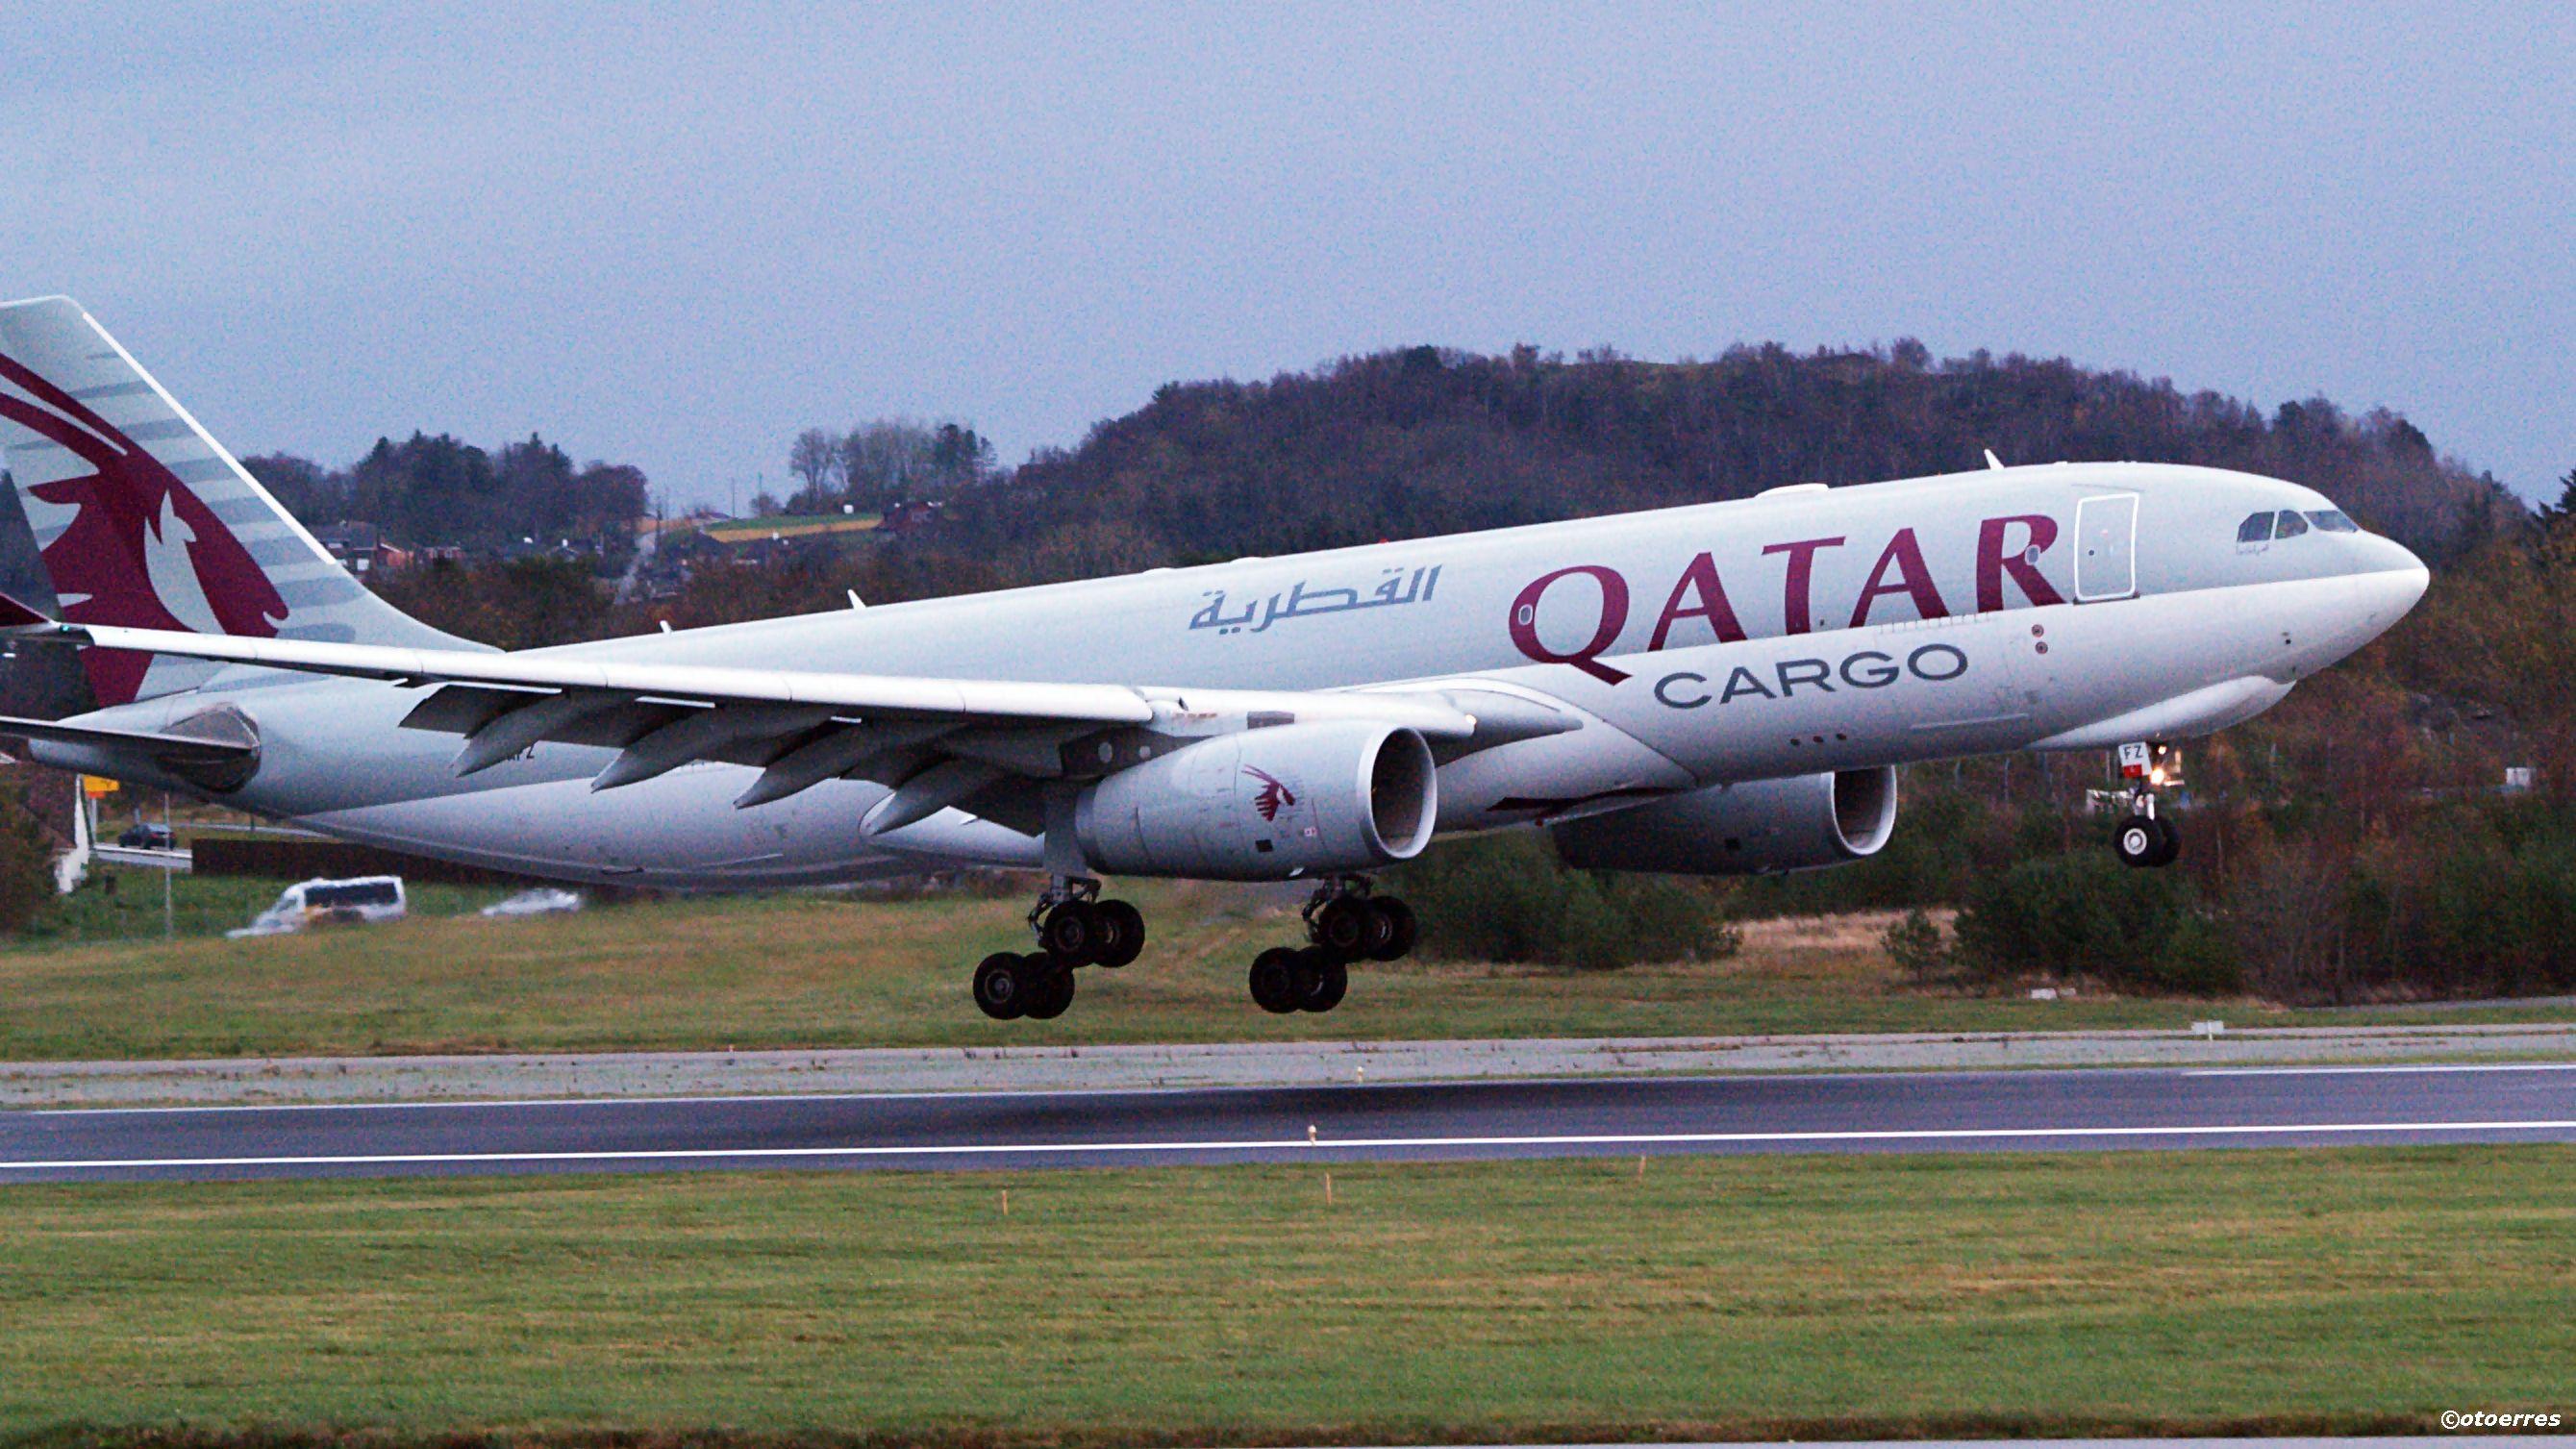 Qatar Airways Cargo - Airbus A 330F